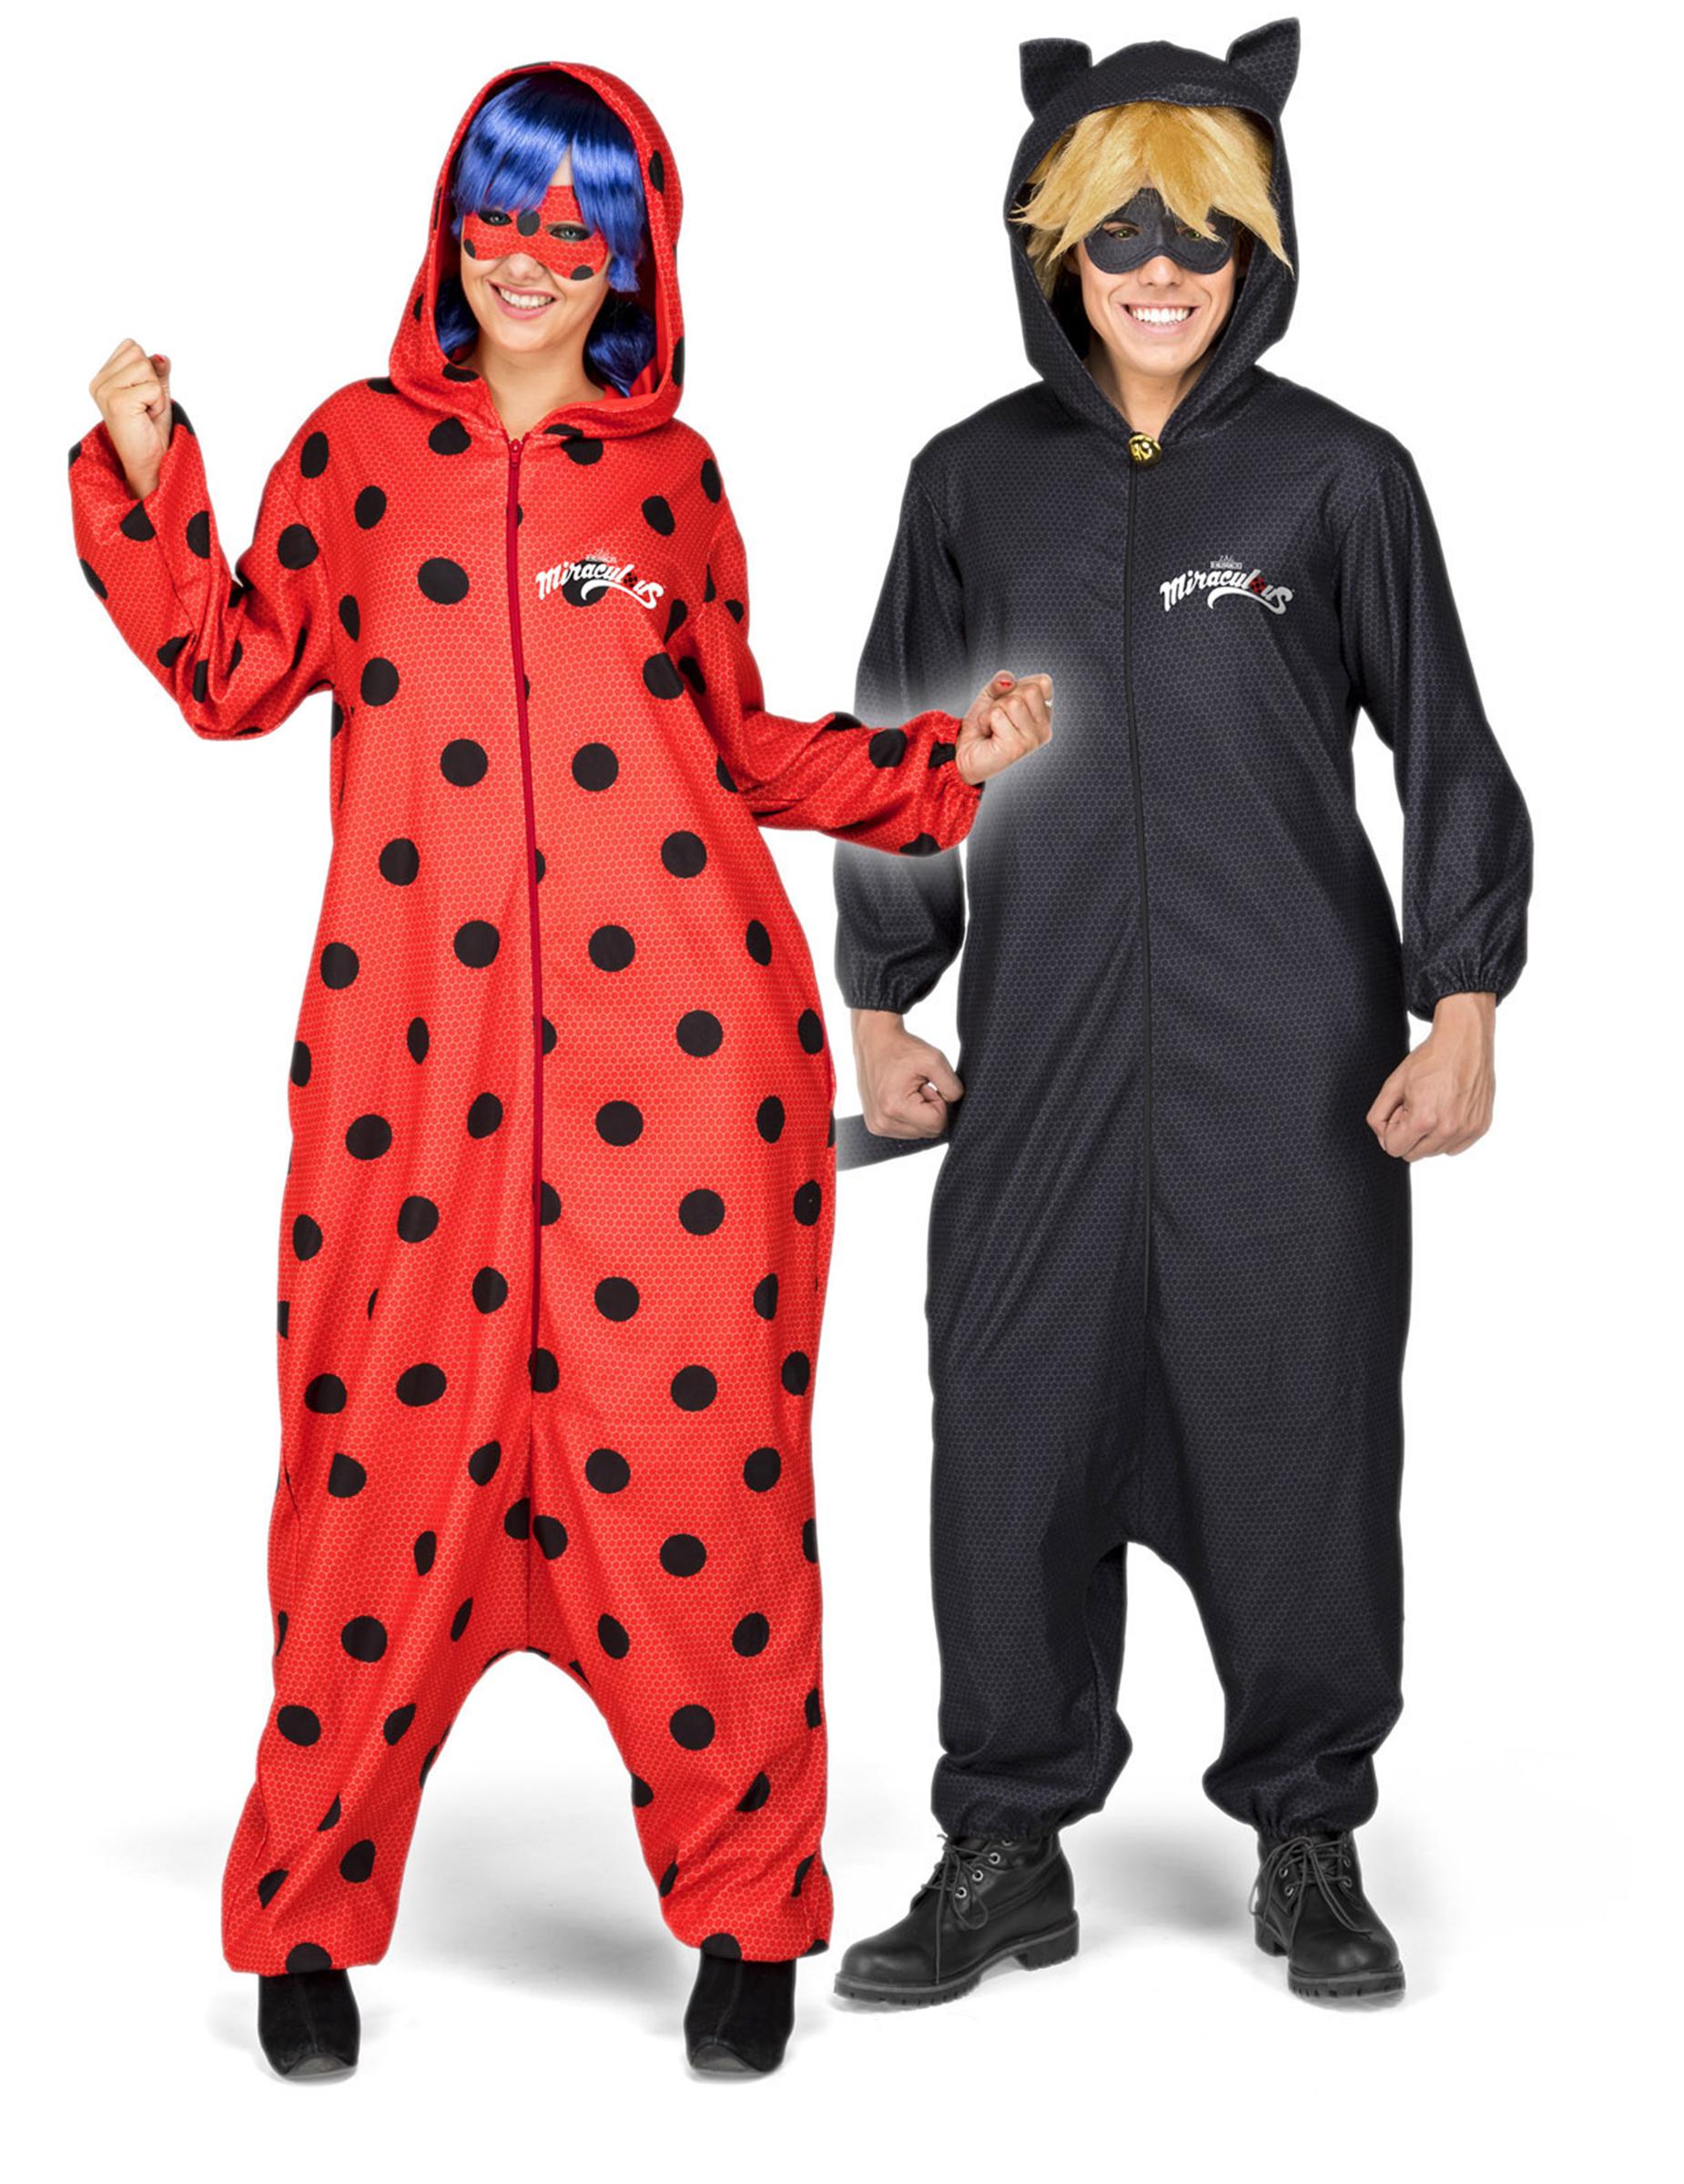 43a5cfff5a8afc Disfarce macacão Ladybug™ adulto e acessórios